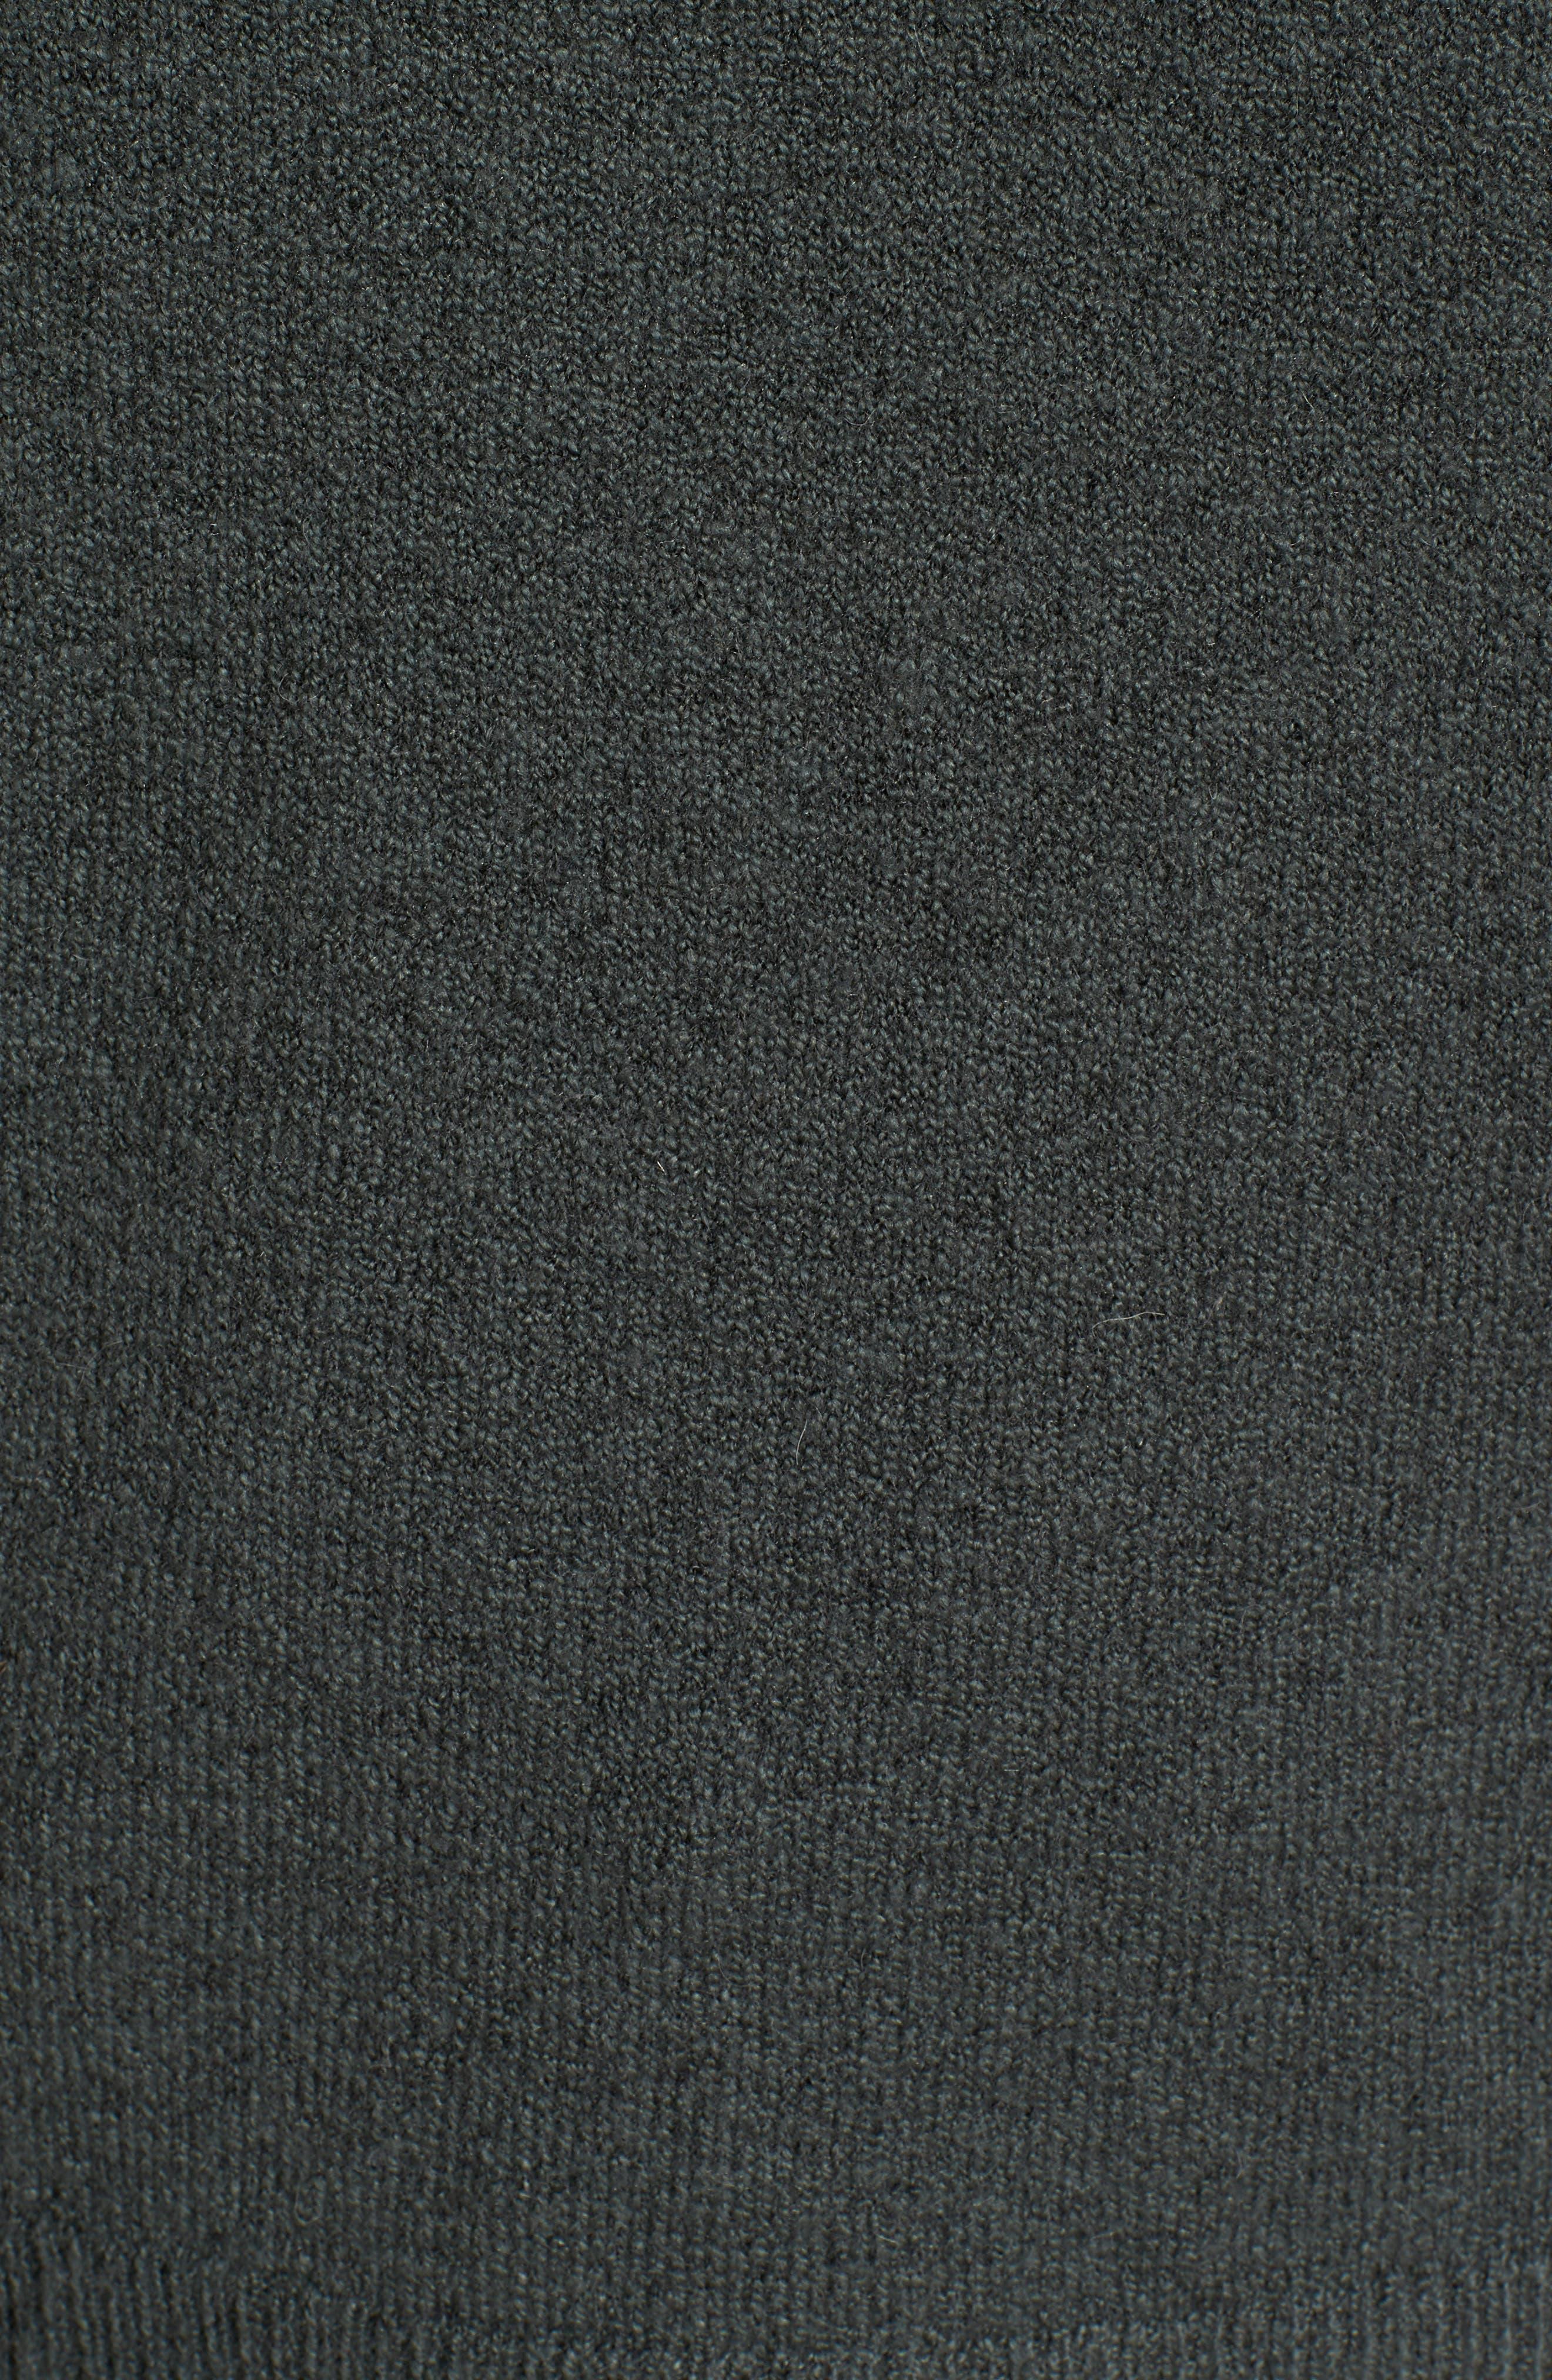 Dolman Sleeve Sweater,                             Alternate thumbnail 18, color,